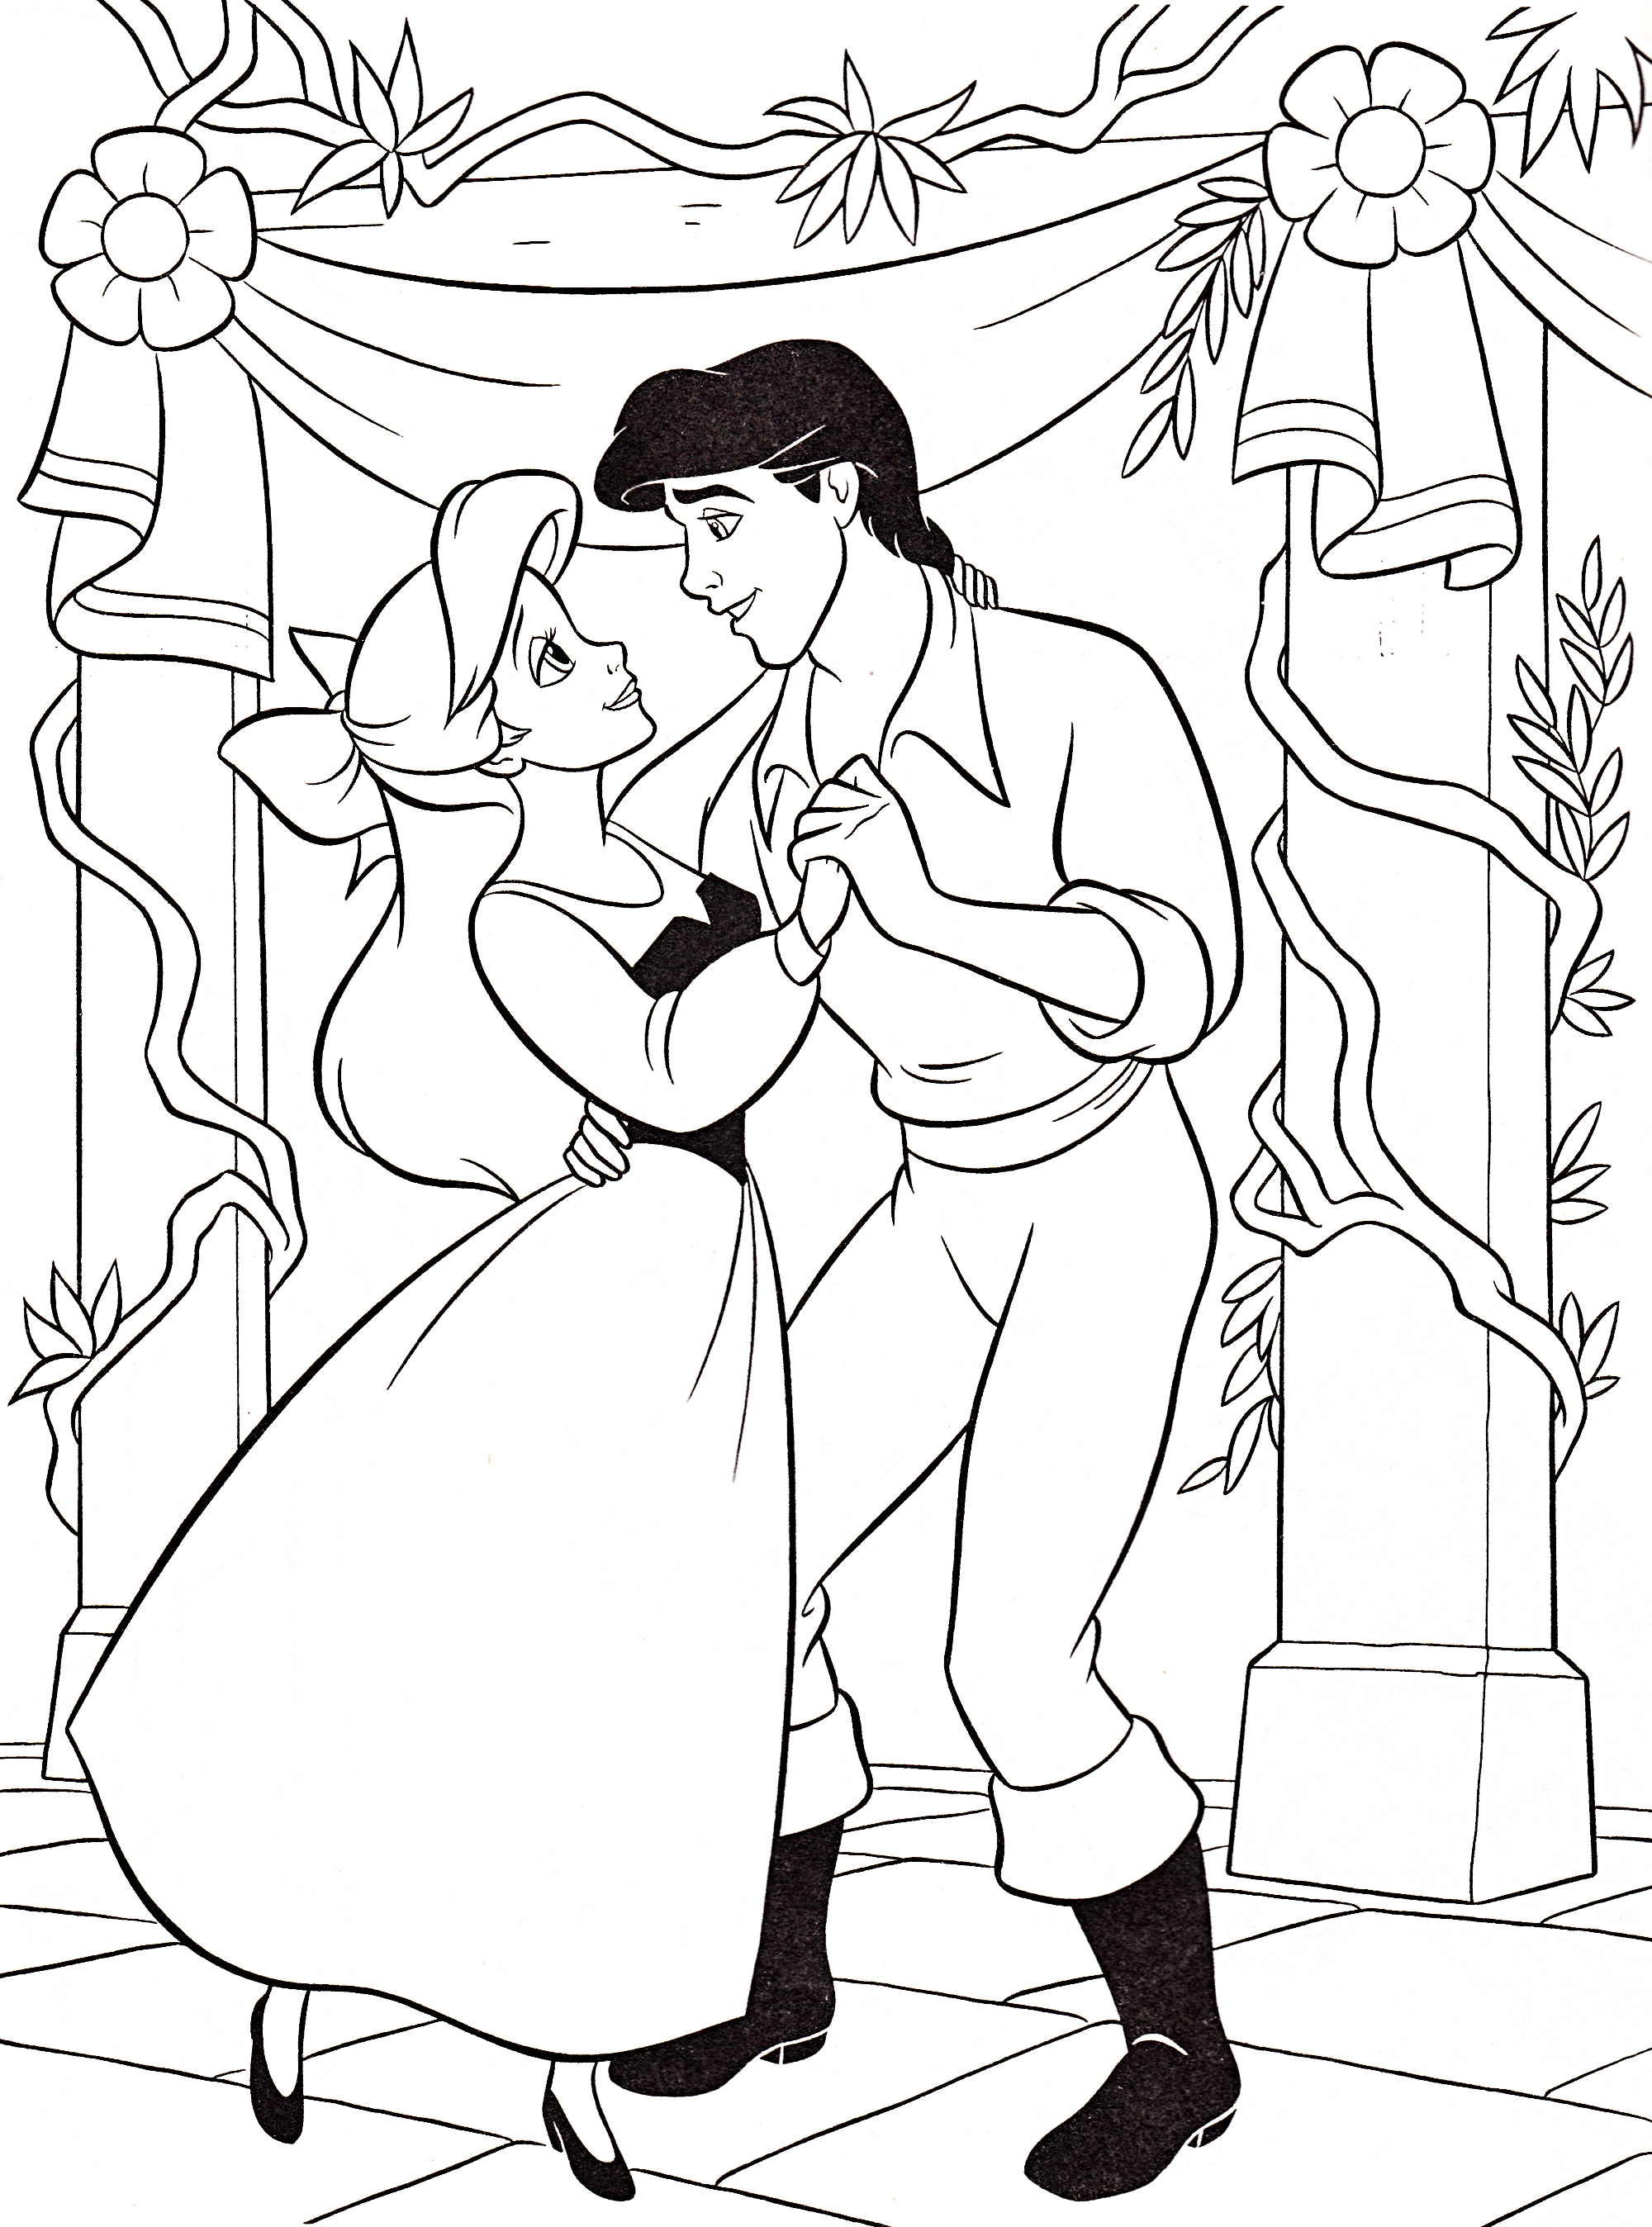 Coloriage De Princesse Ariel A Imprimer.Coloriage Disney Princesse Ariel Et Prince Eric A Imprimer